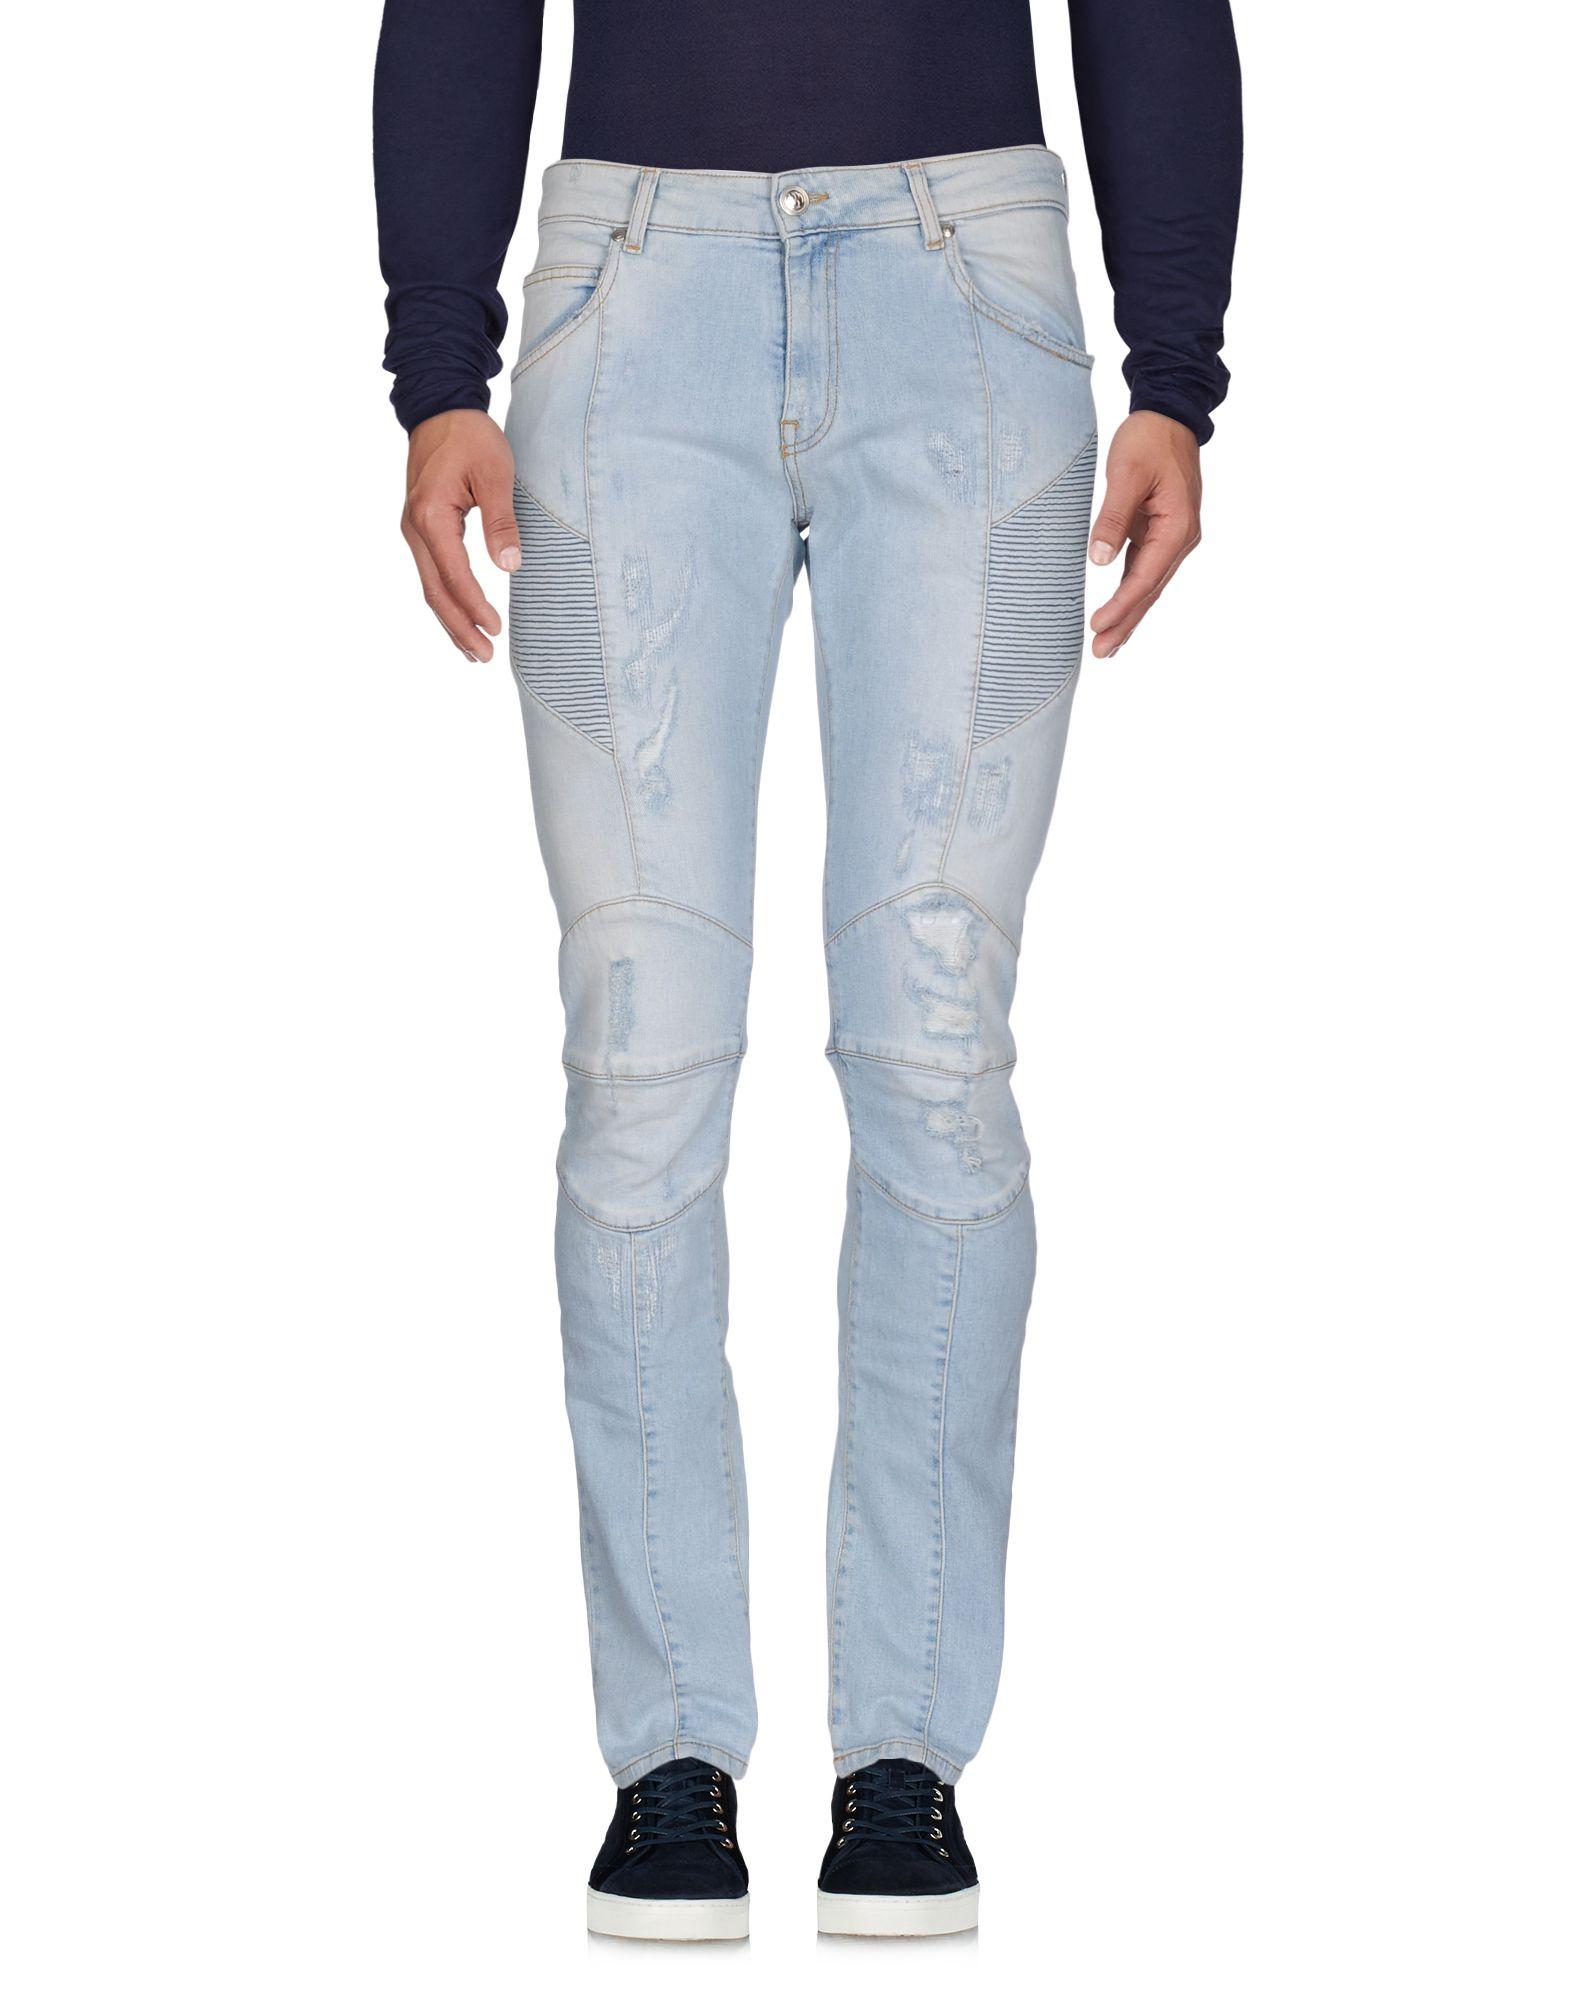 Pantaloni Jeans Pierre Pierre Pierre Balmain Uomo - 42591155IJ 365ce9